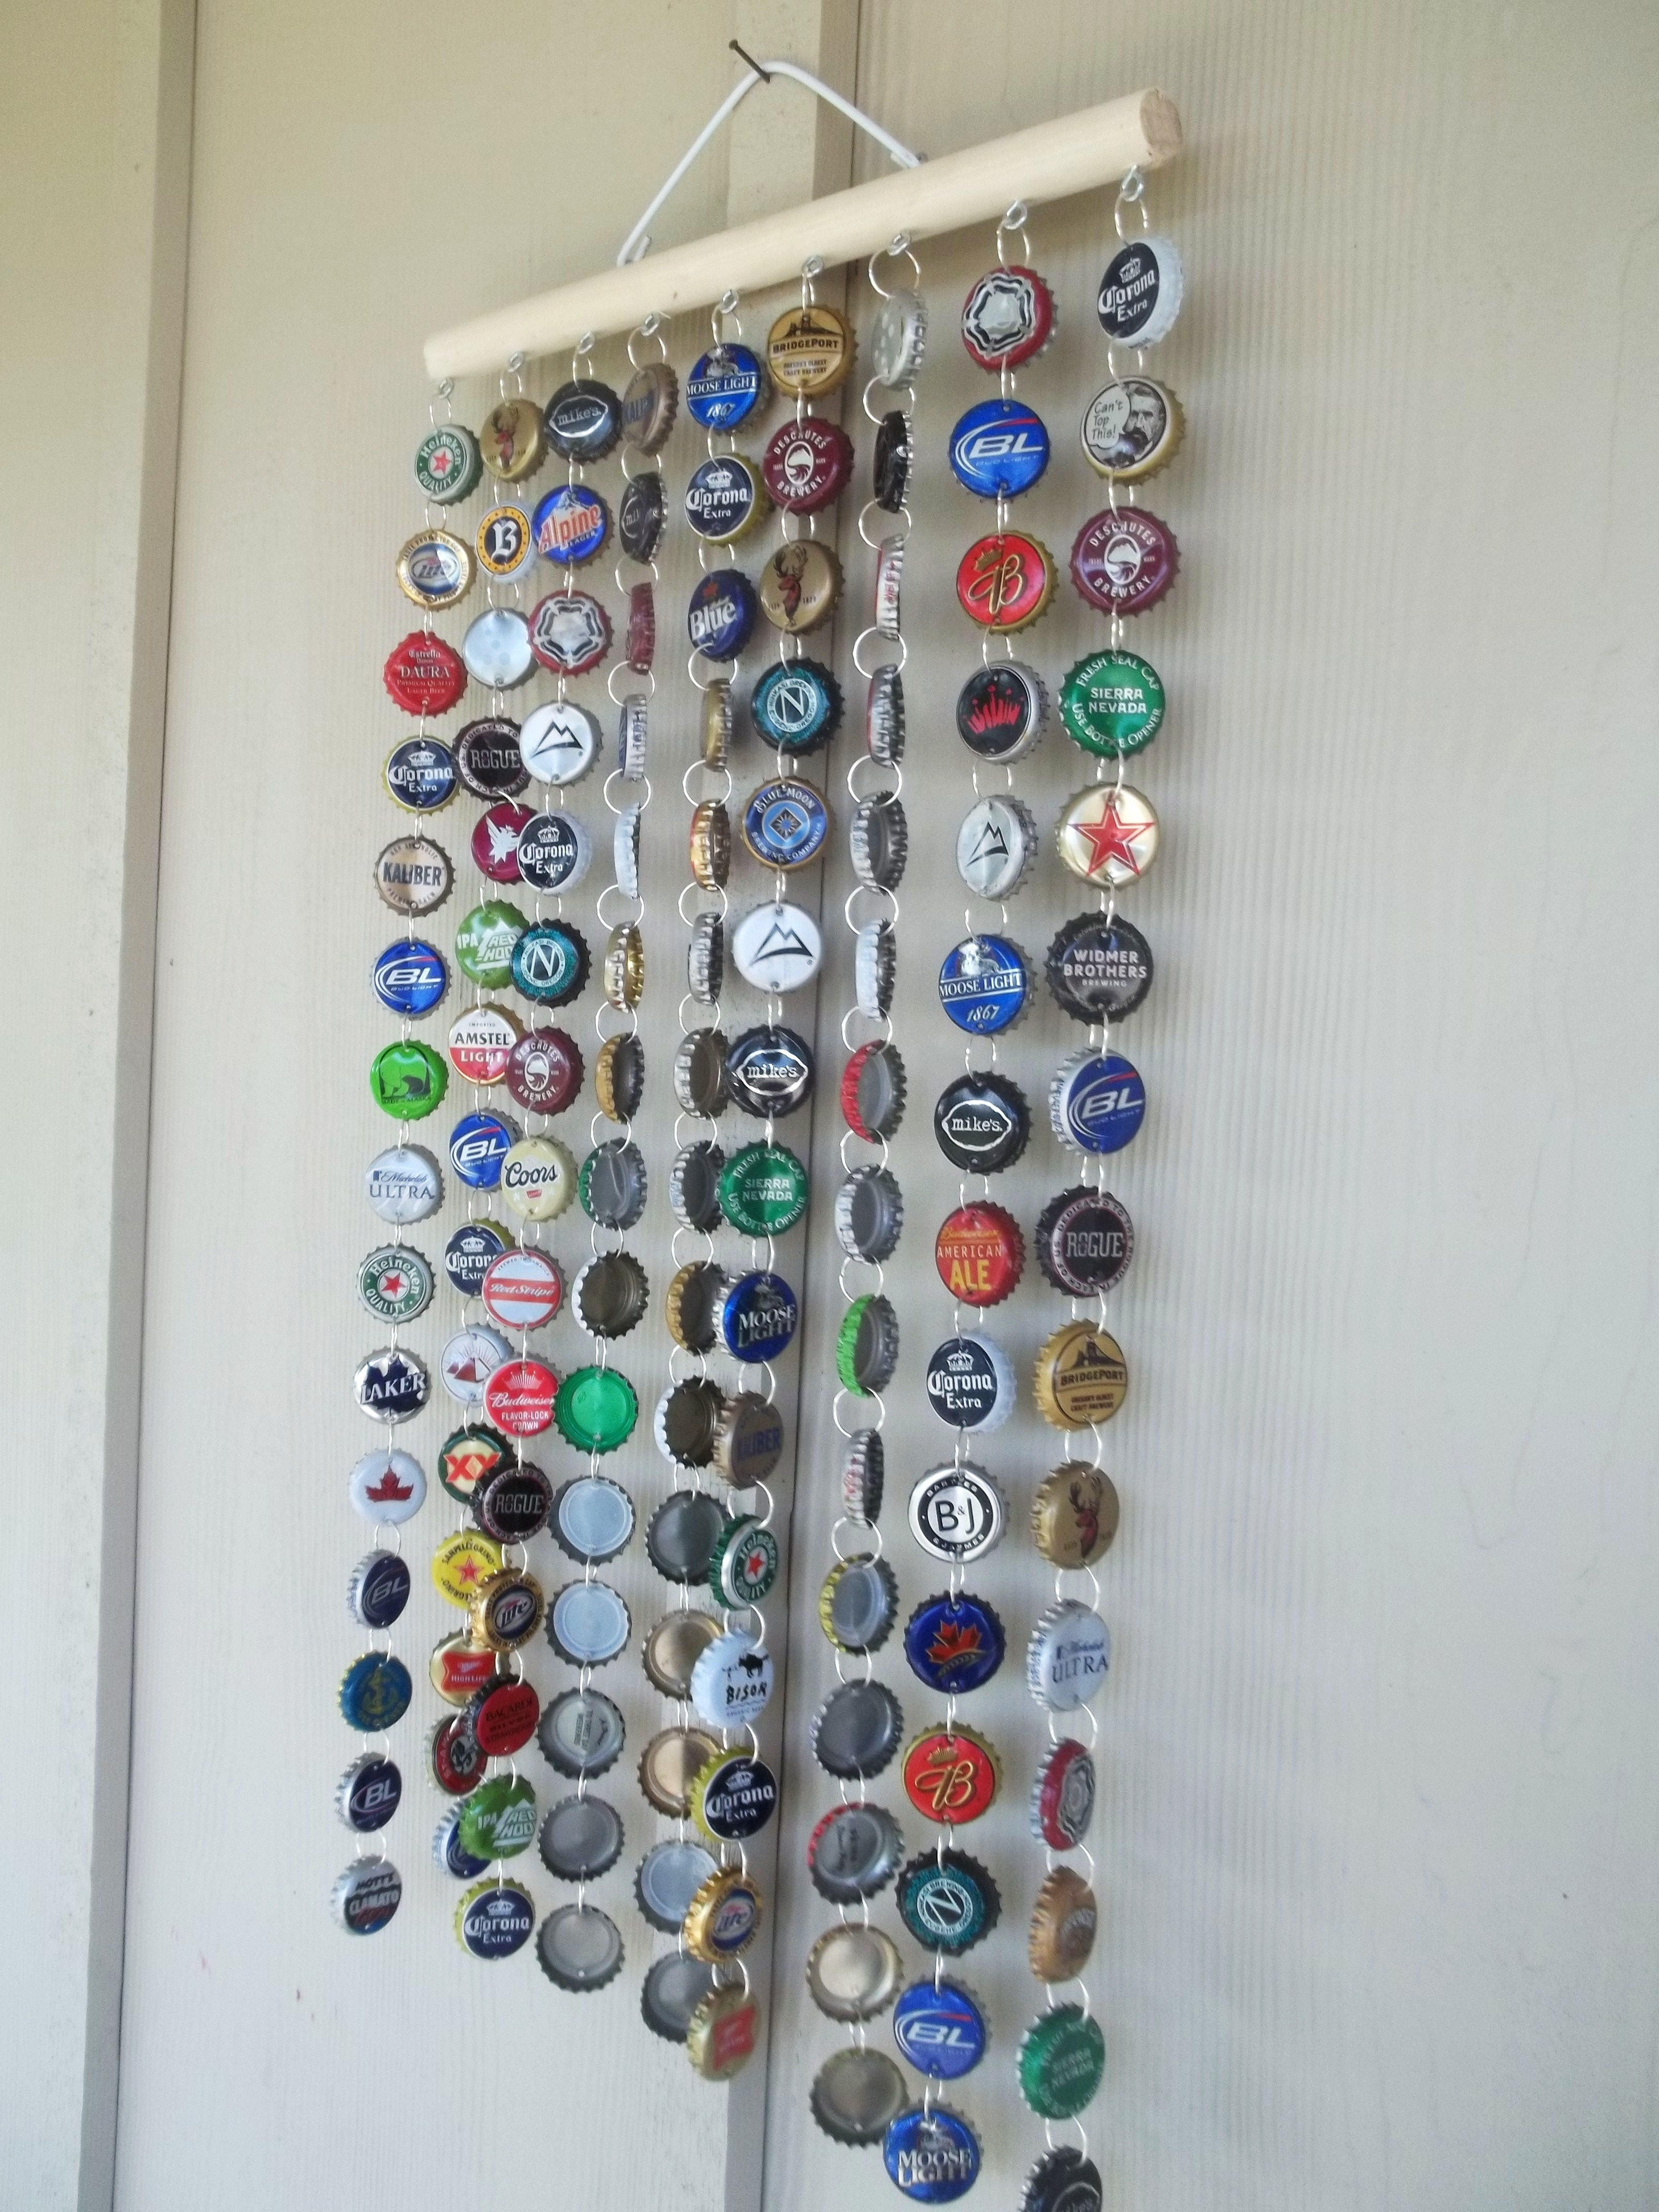 beer bottle cap wind chime windlichten carillon carillon vent capsule de biere. Black Bedroom Furniture Sets. Home Design Ideas